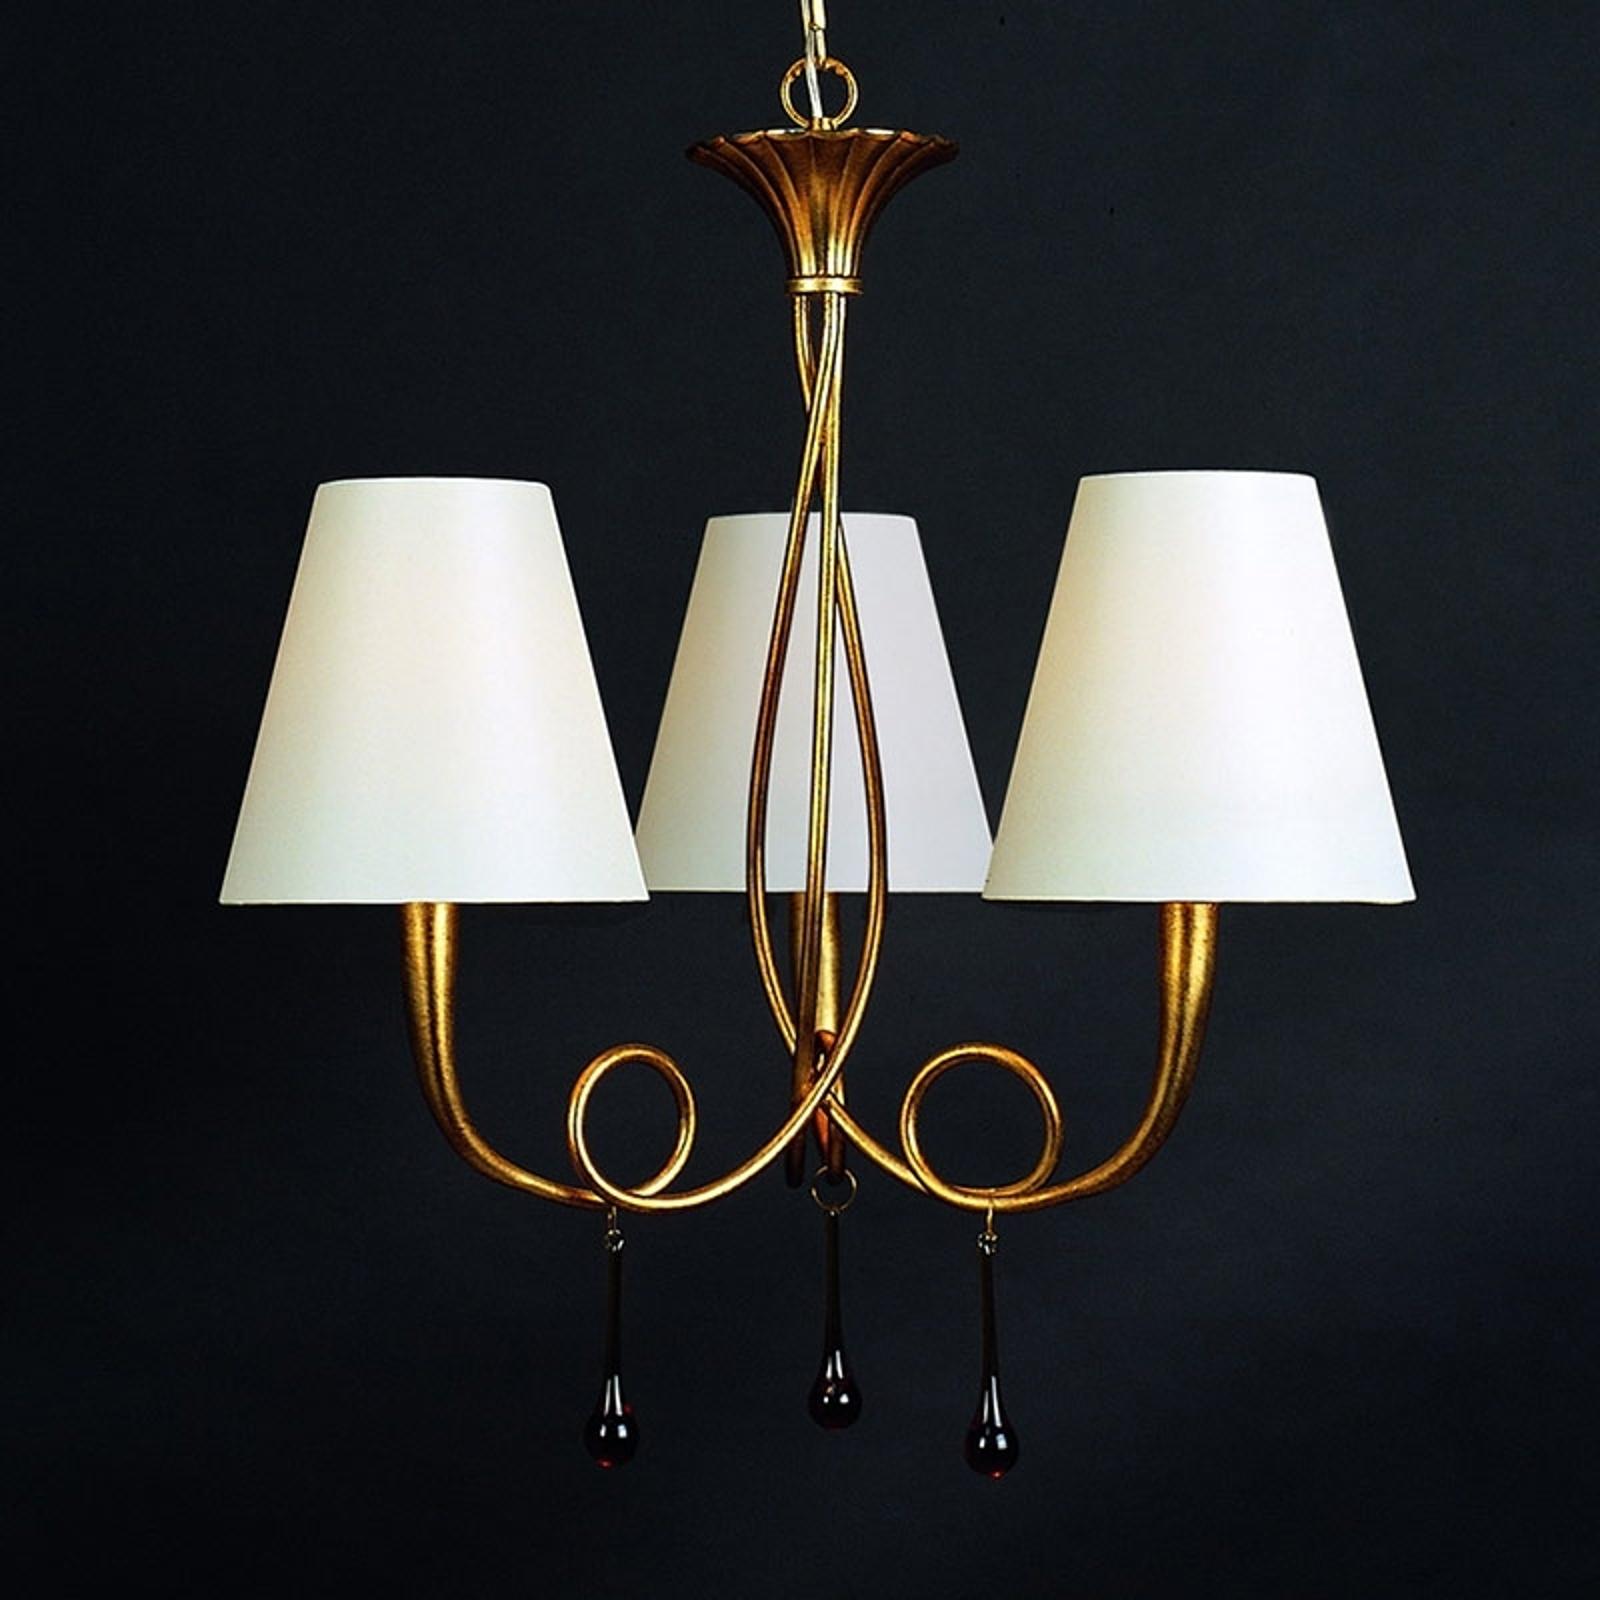 Wandlamp Paola m 3 lampjes goud m textiel lampenk